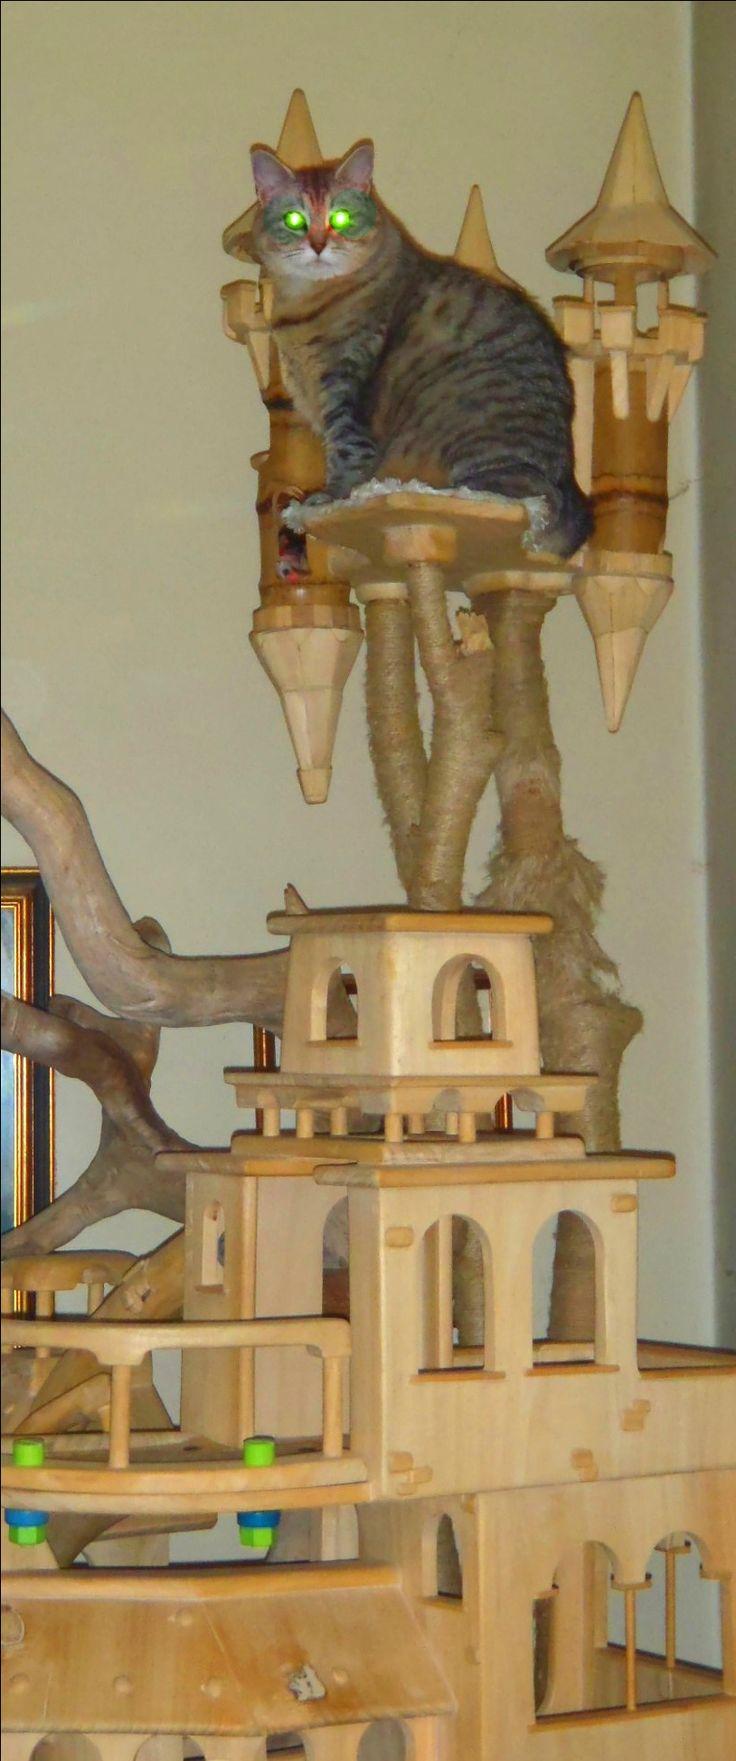 DomusfeliS - special playzone for cats, unique pieces for unique cats - sculptures for cats, untreated precius wood: plum, apricot, seasoned poplar, birch, bamboo, wild oak and piracanta. #luxurycatcastle #castlecat #catcastle #cattower #cattree #catcondo #cattoy #catenclosure #catfrendlyhouse #amazingcatscratching #catscratchforniture #cataccessories #catforniture